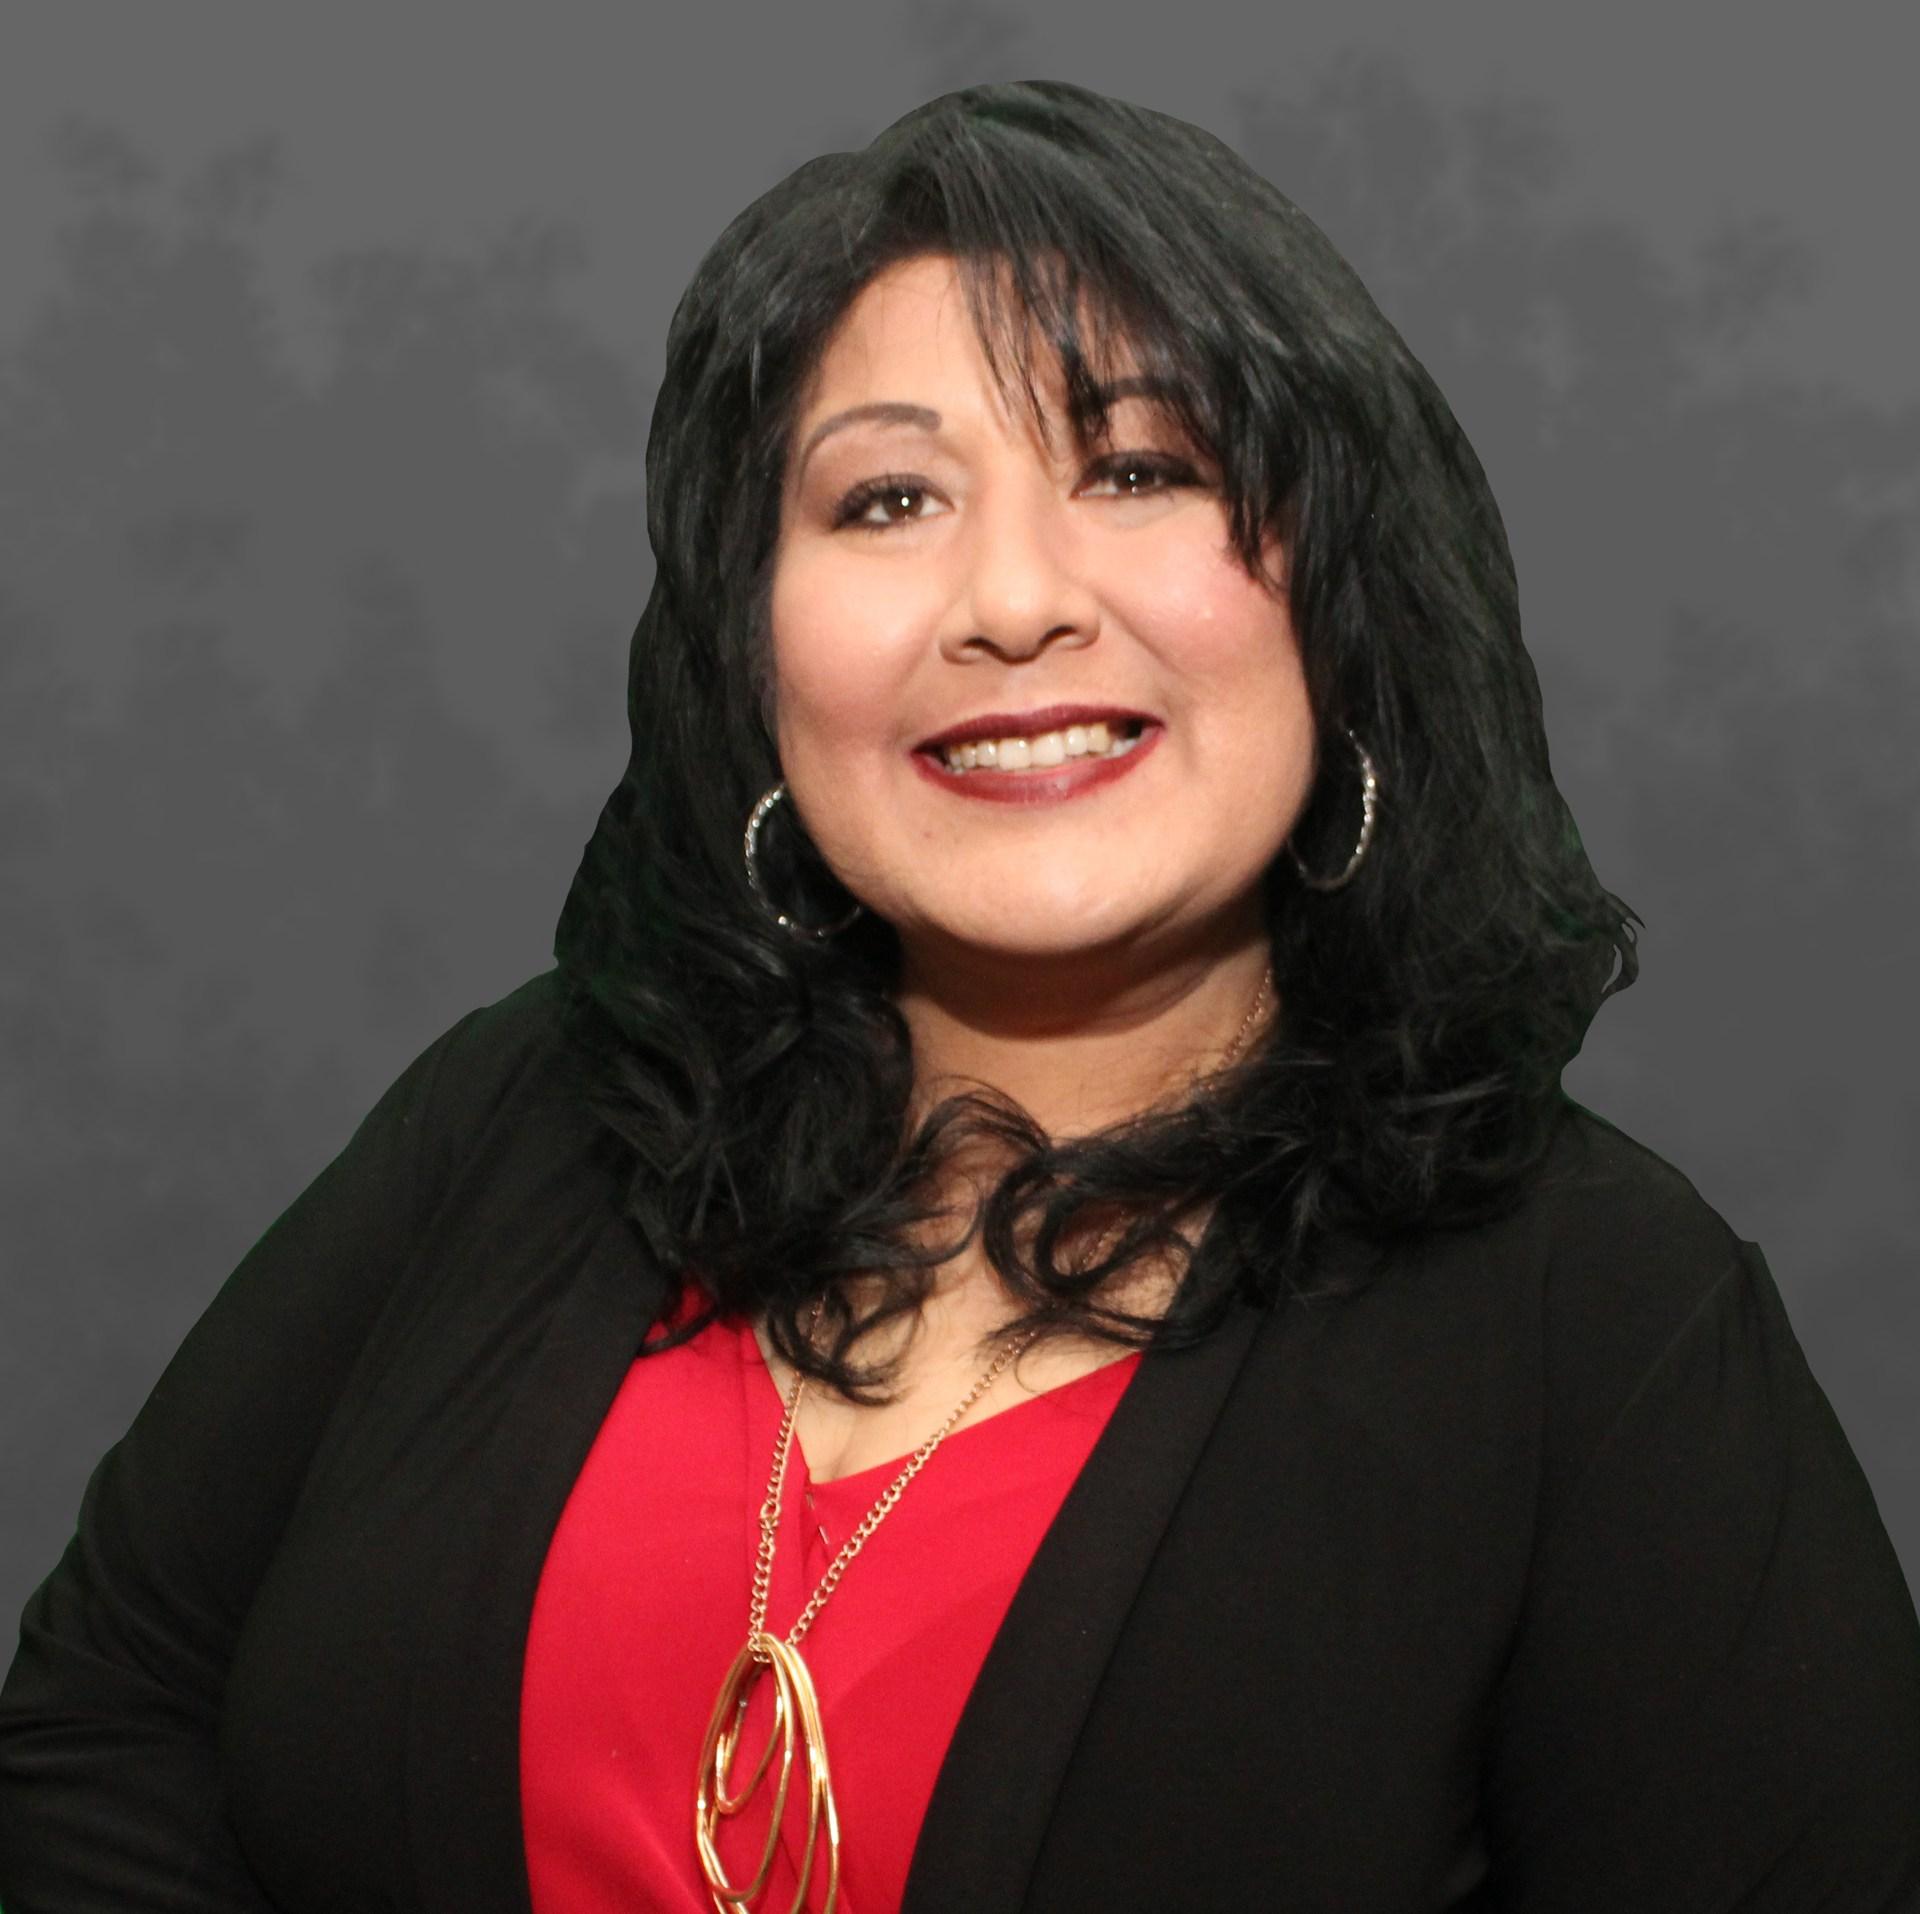 Board Trustee Monique Celedon